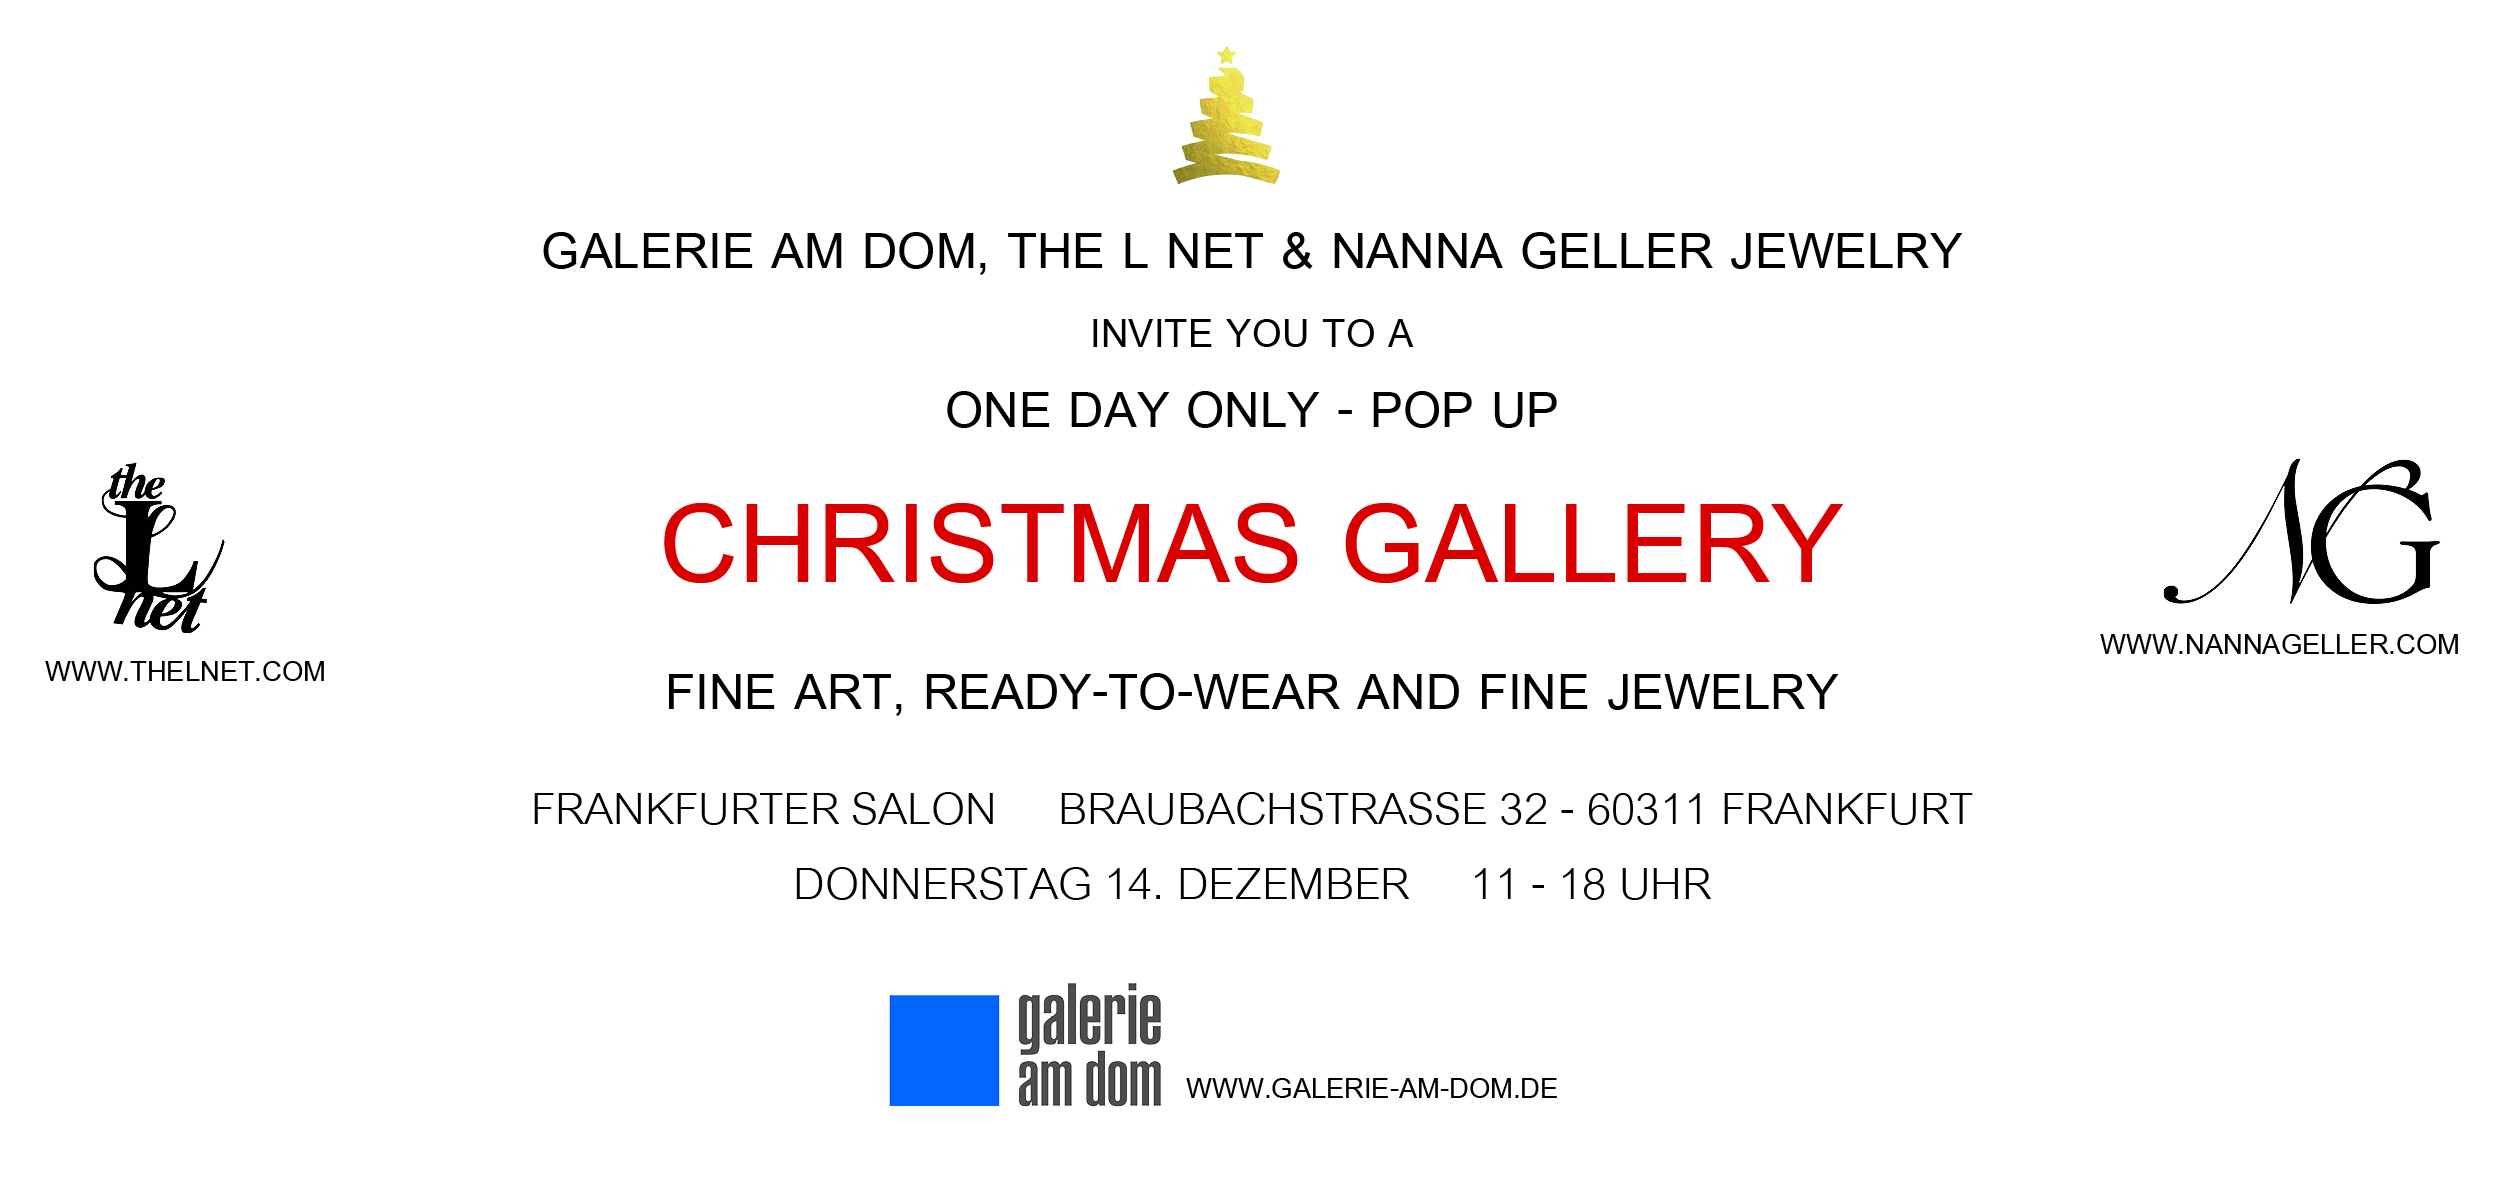 Christmas-Gallery_Frankfurter-Salon